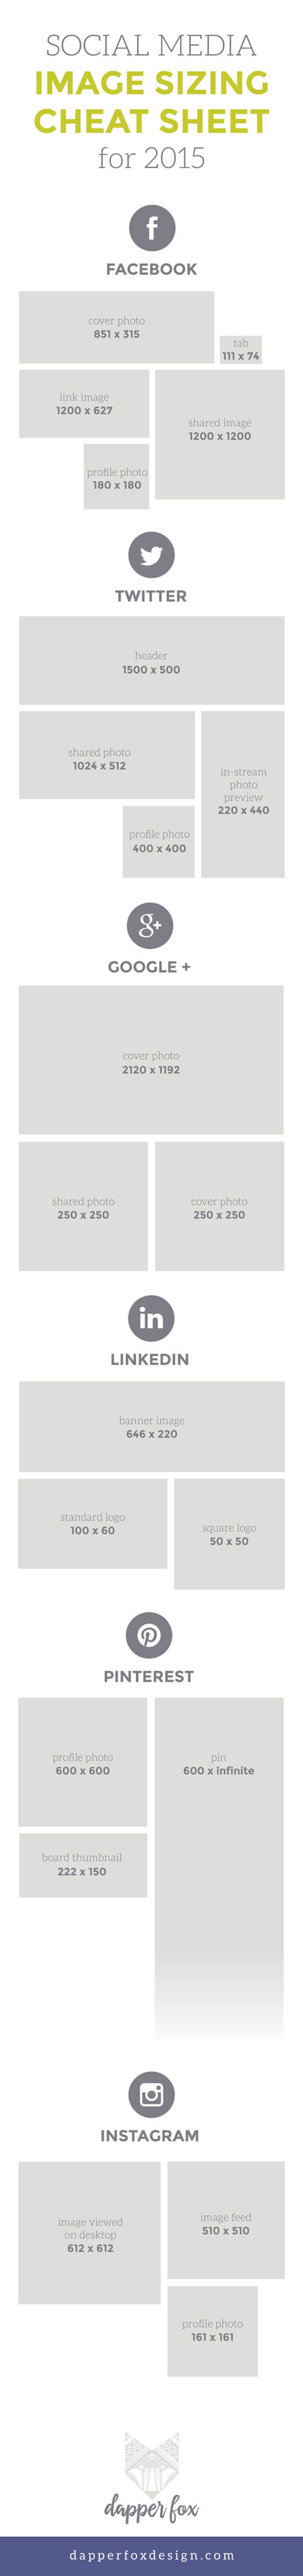 2015 Social Media Image Sizing Cheat Sheet by Dapper Fox Design//  Website Design - Branding - Logo Design - Entrepreneur Blog and Resource